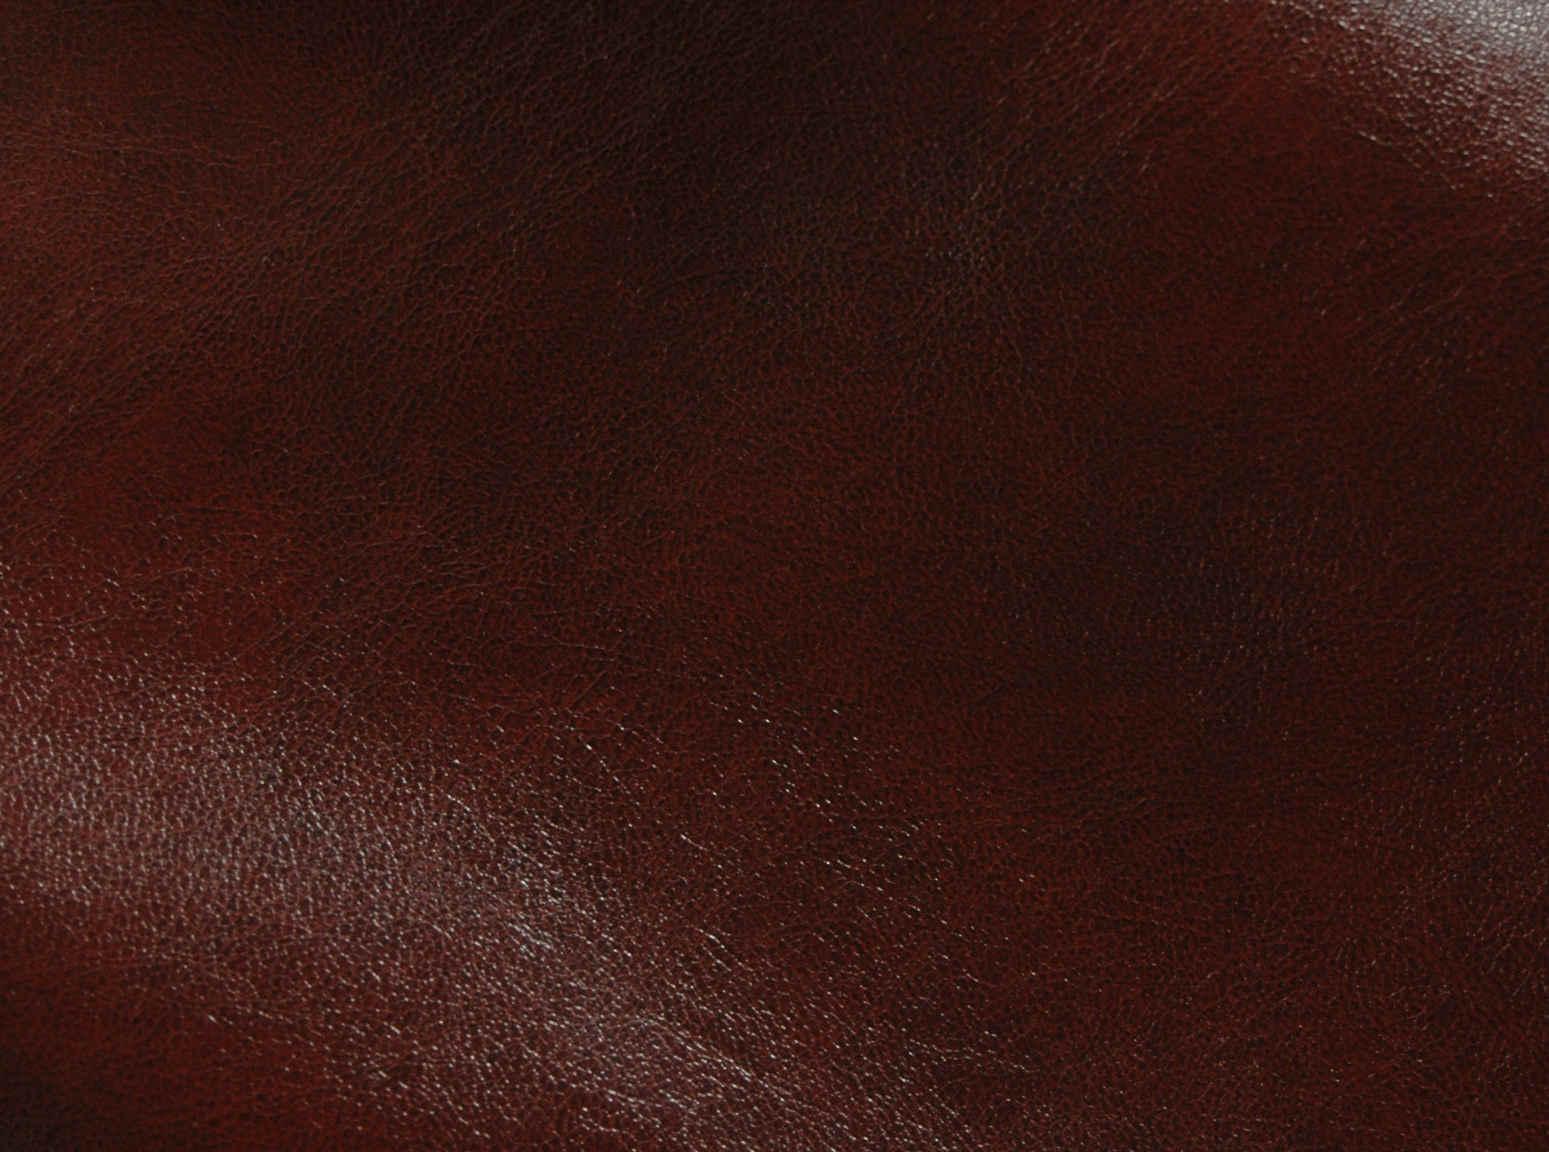 Suede Upholstery Fabric >> Burgundy vinyl upholstery fabric - waterproof Cordovan